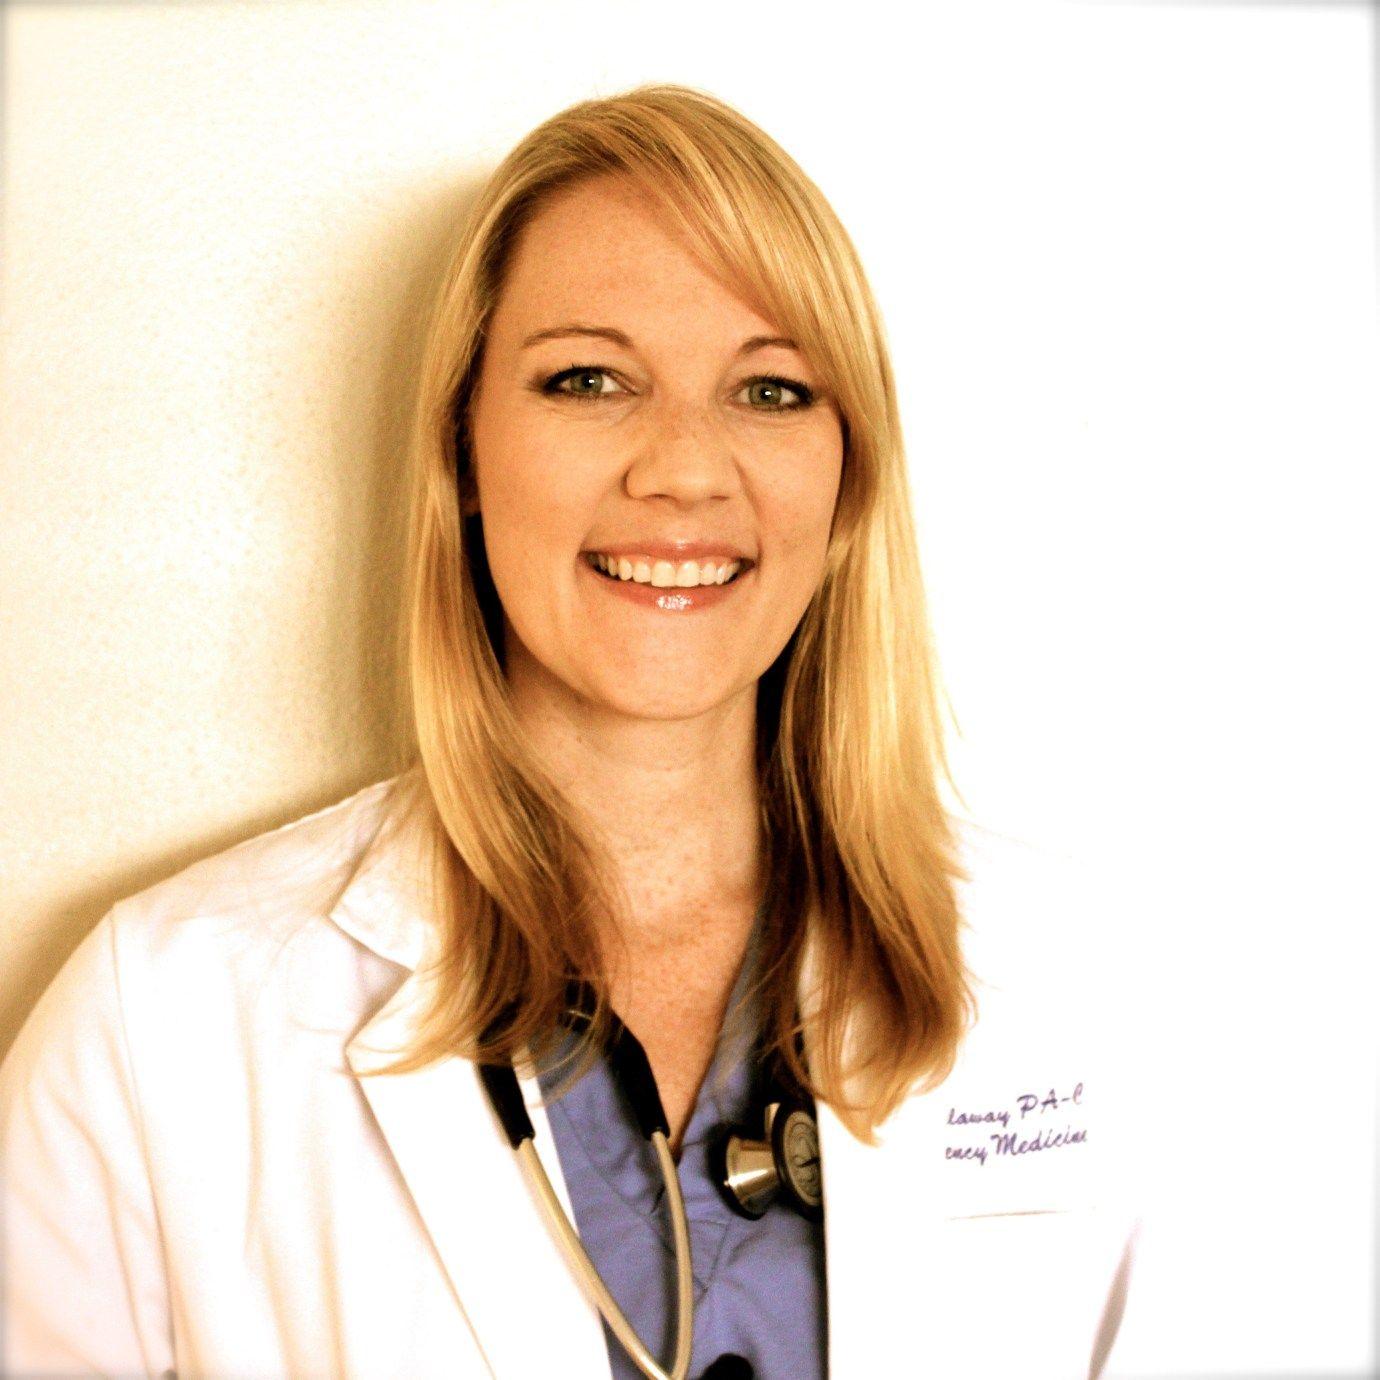 PA Leadership Series Kate Callaway, PAC Empowered PAs